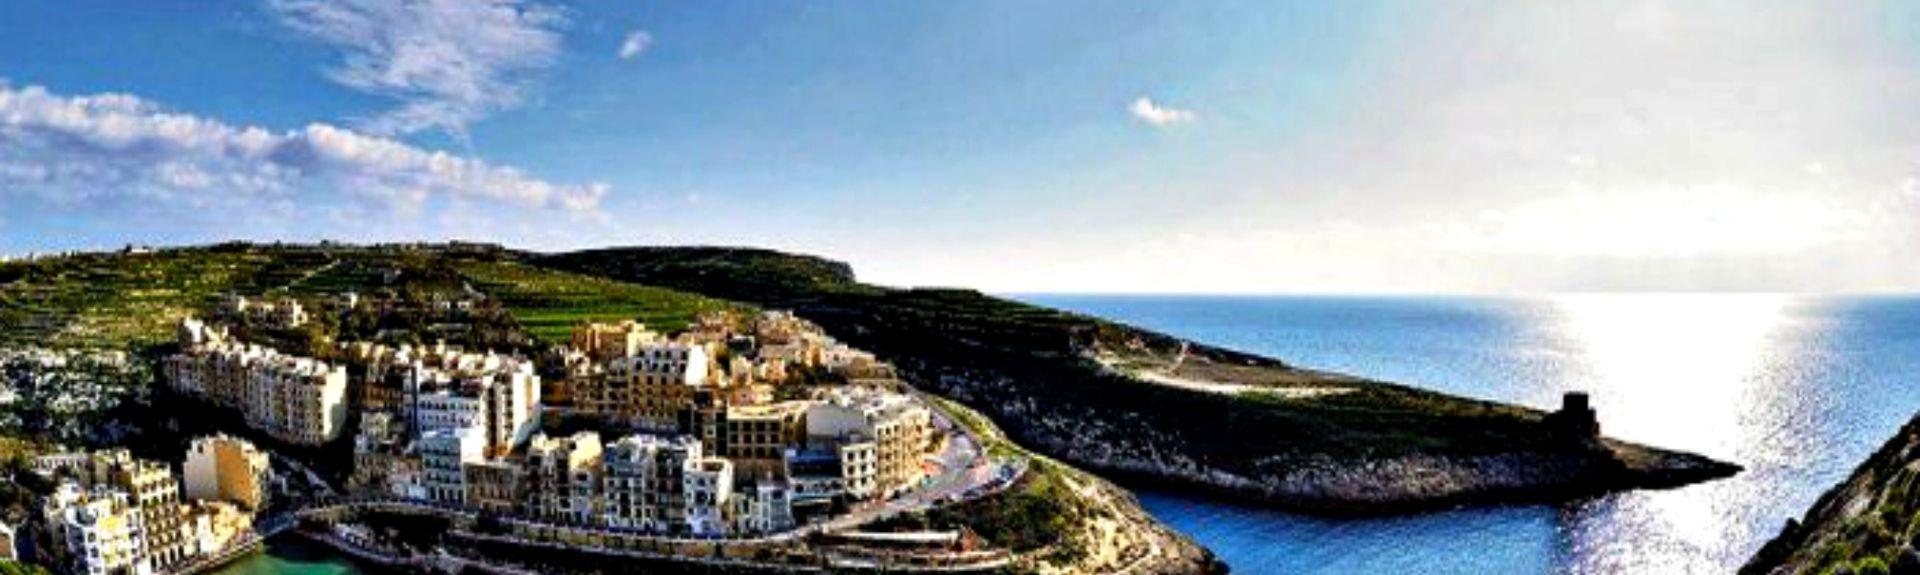 L-Imġarr, Malte